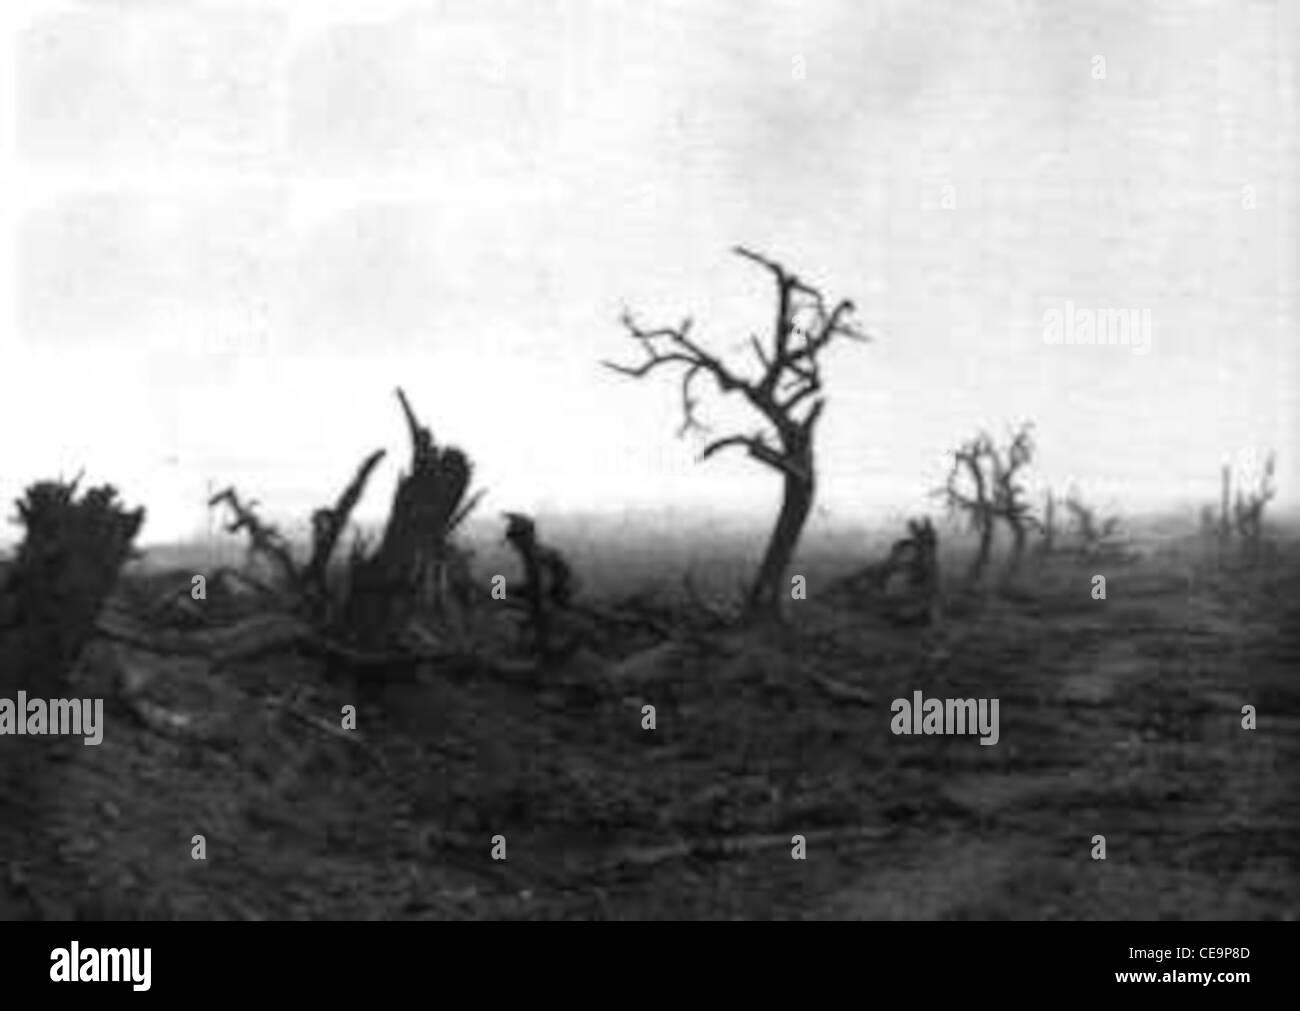 world war 1 No Man's Land. - Stock Image